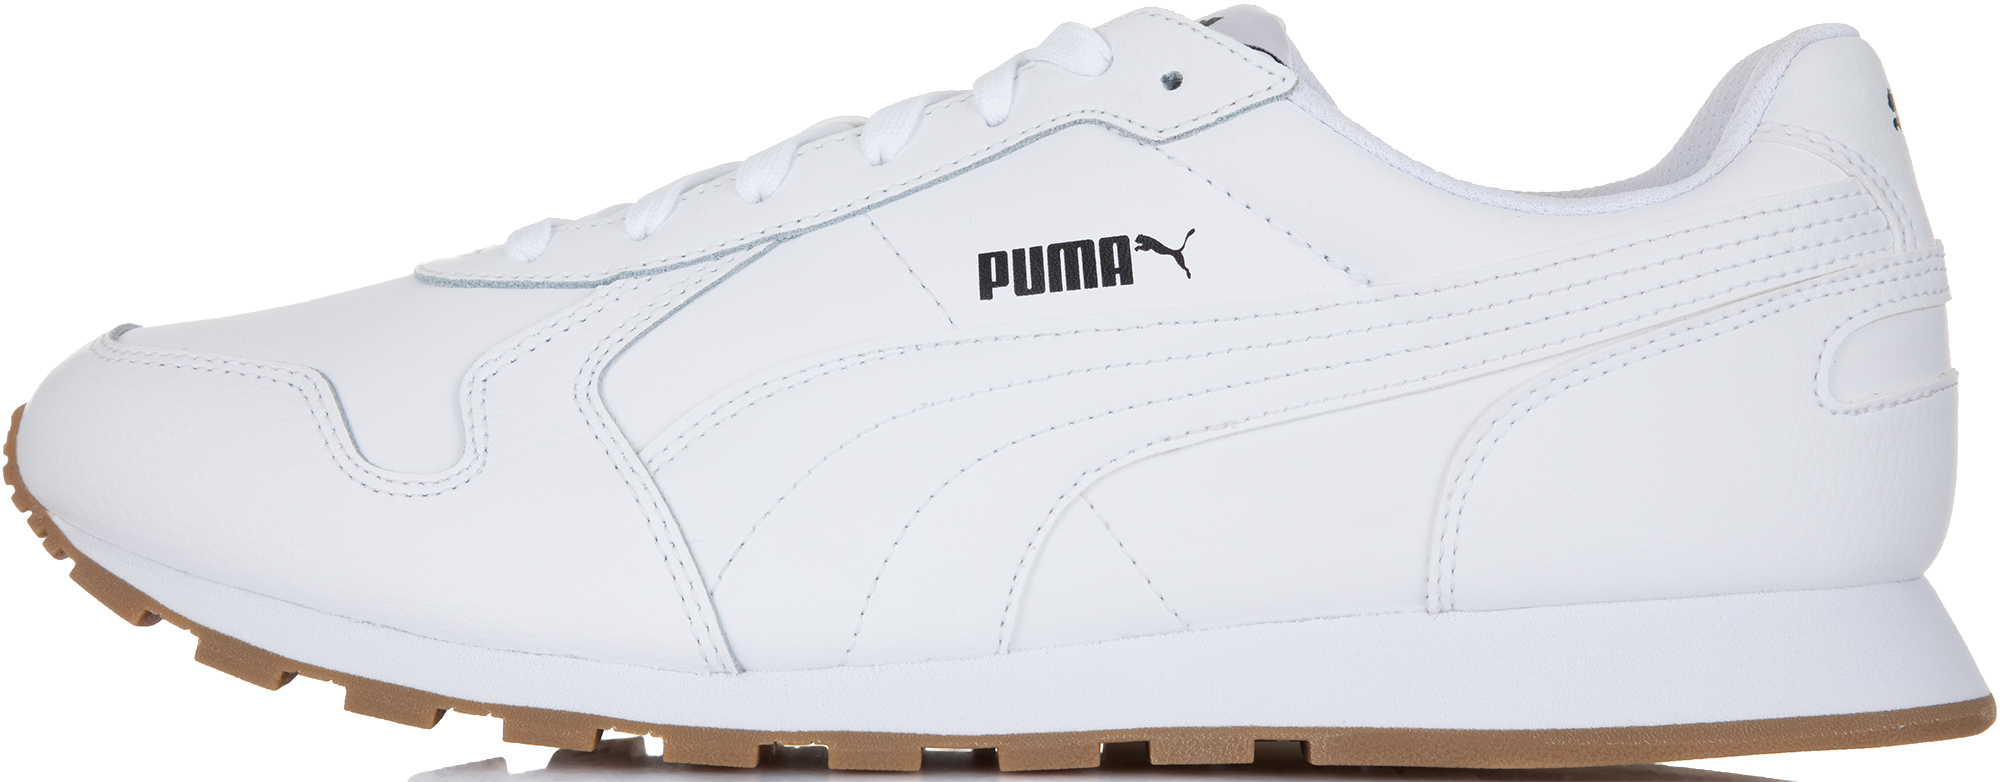 Puma Кроссовки мужские Puma ST Runner Full, размер 45 цены онлайн